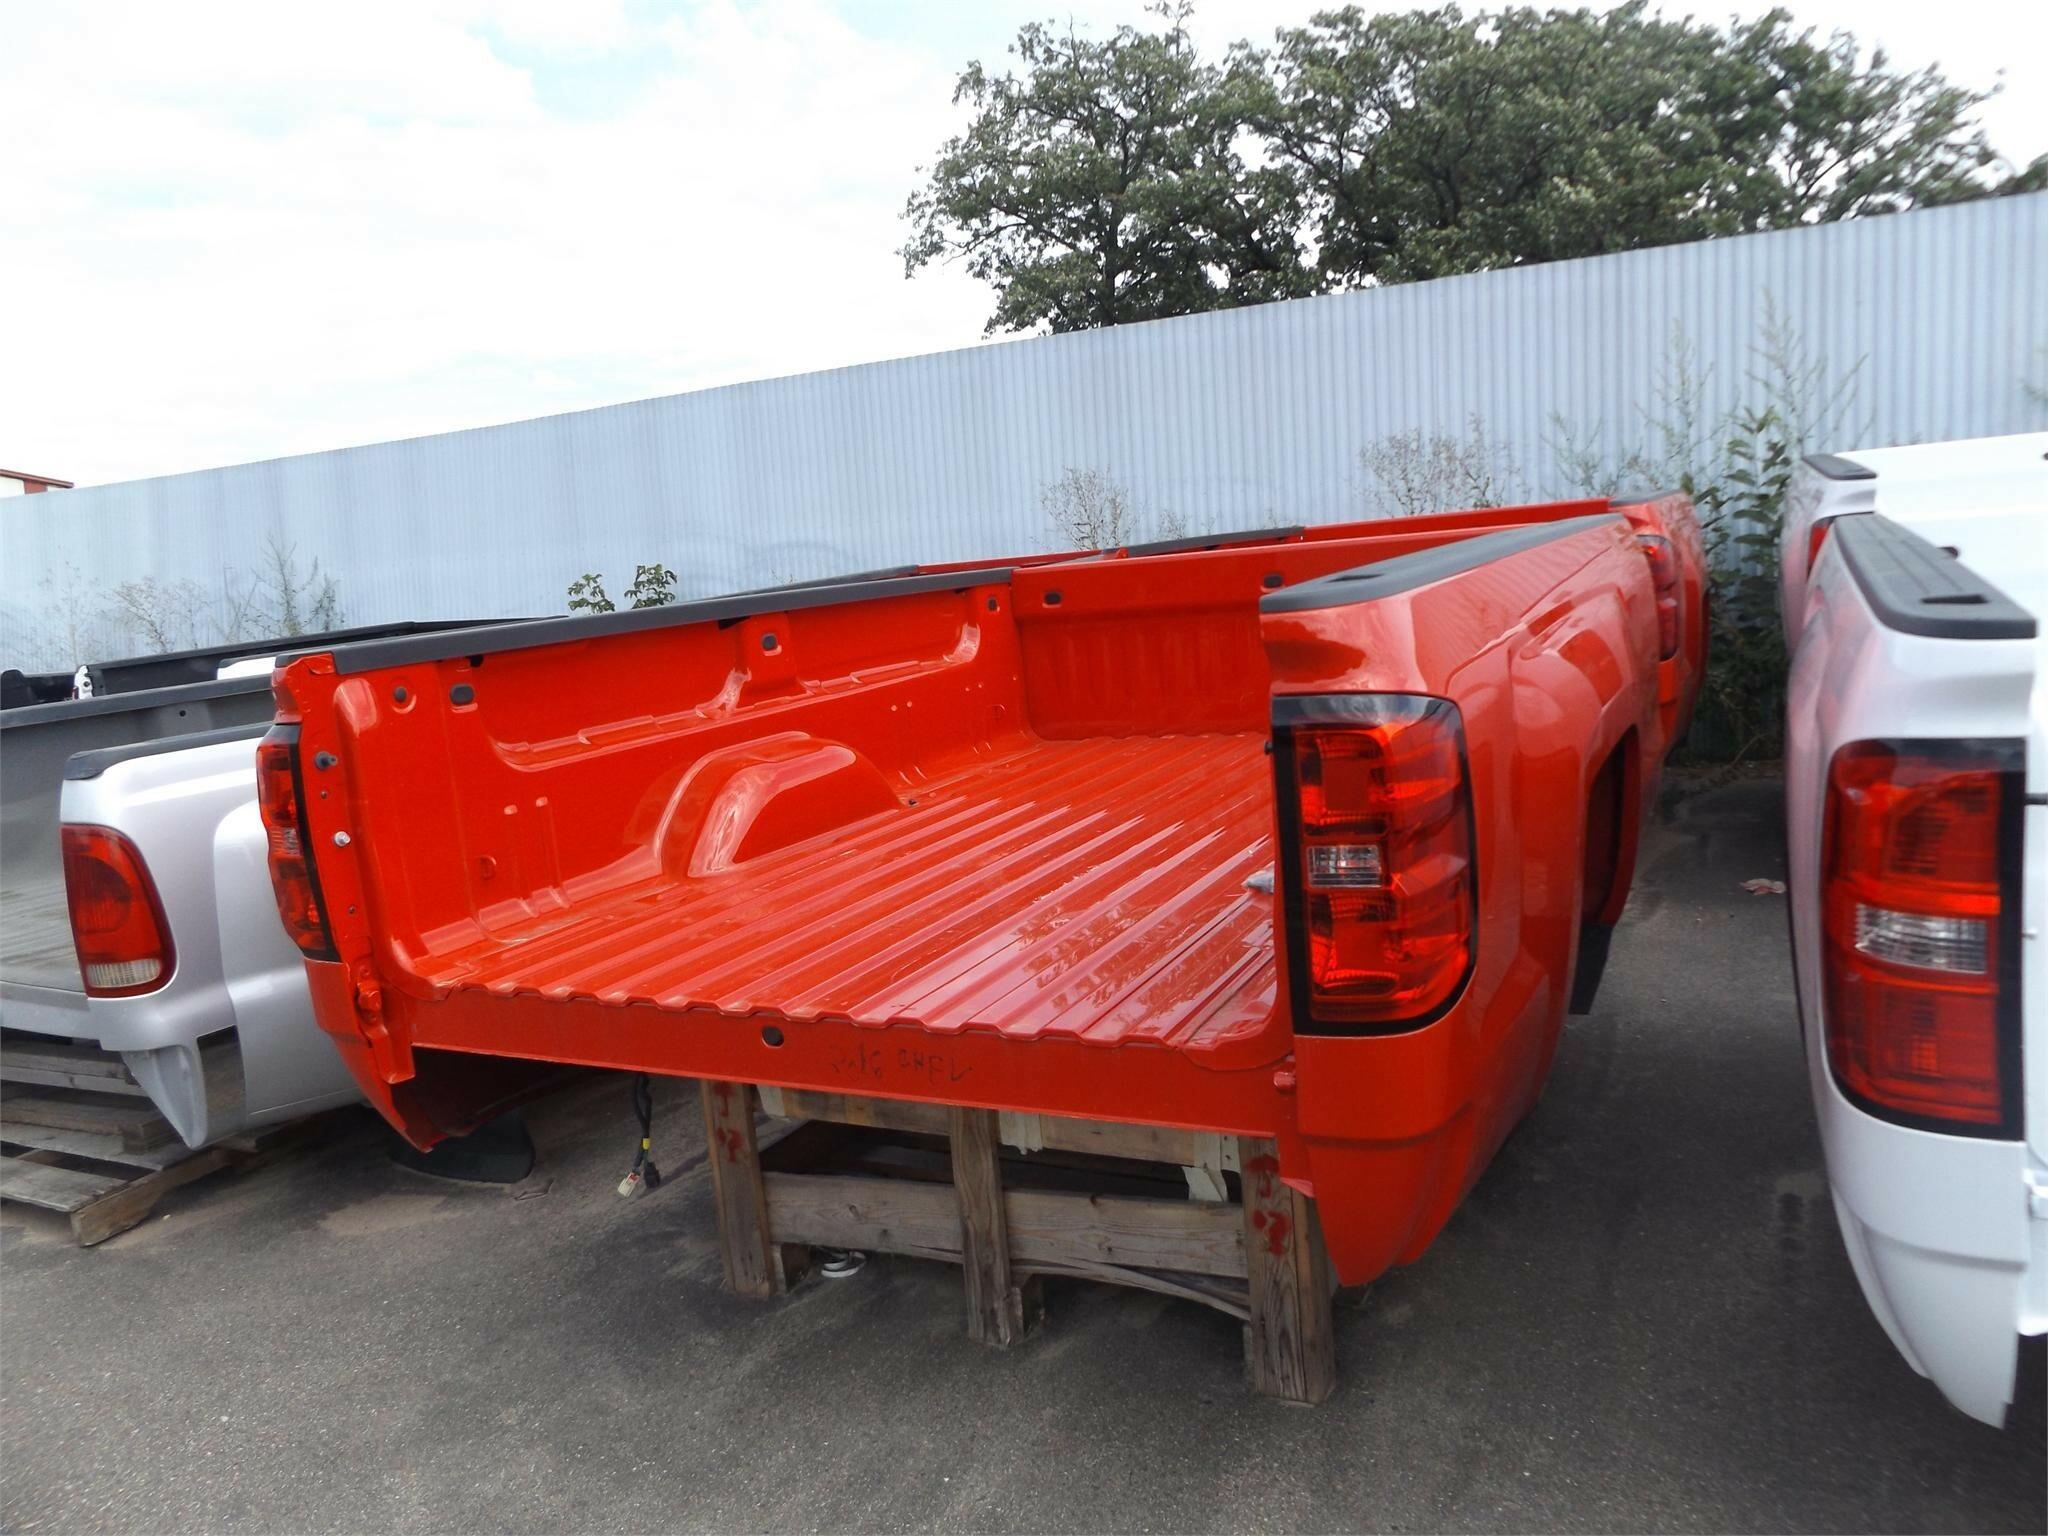 2016 Chevrolet 8 ft Truck Bed